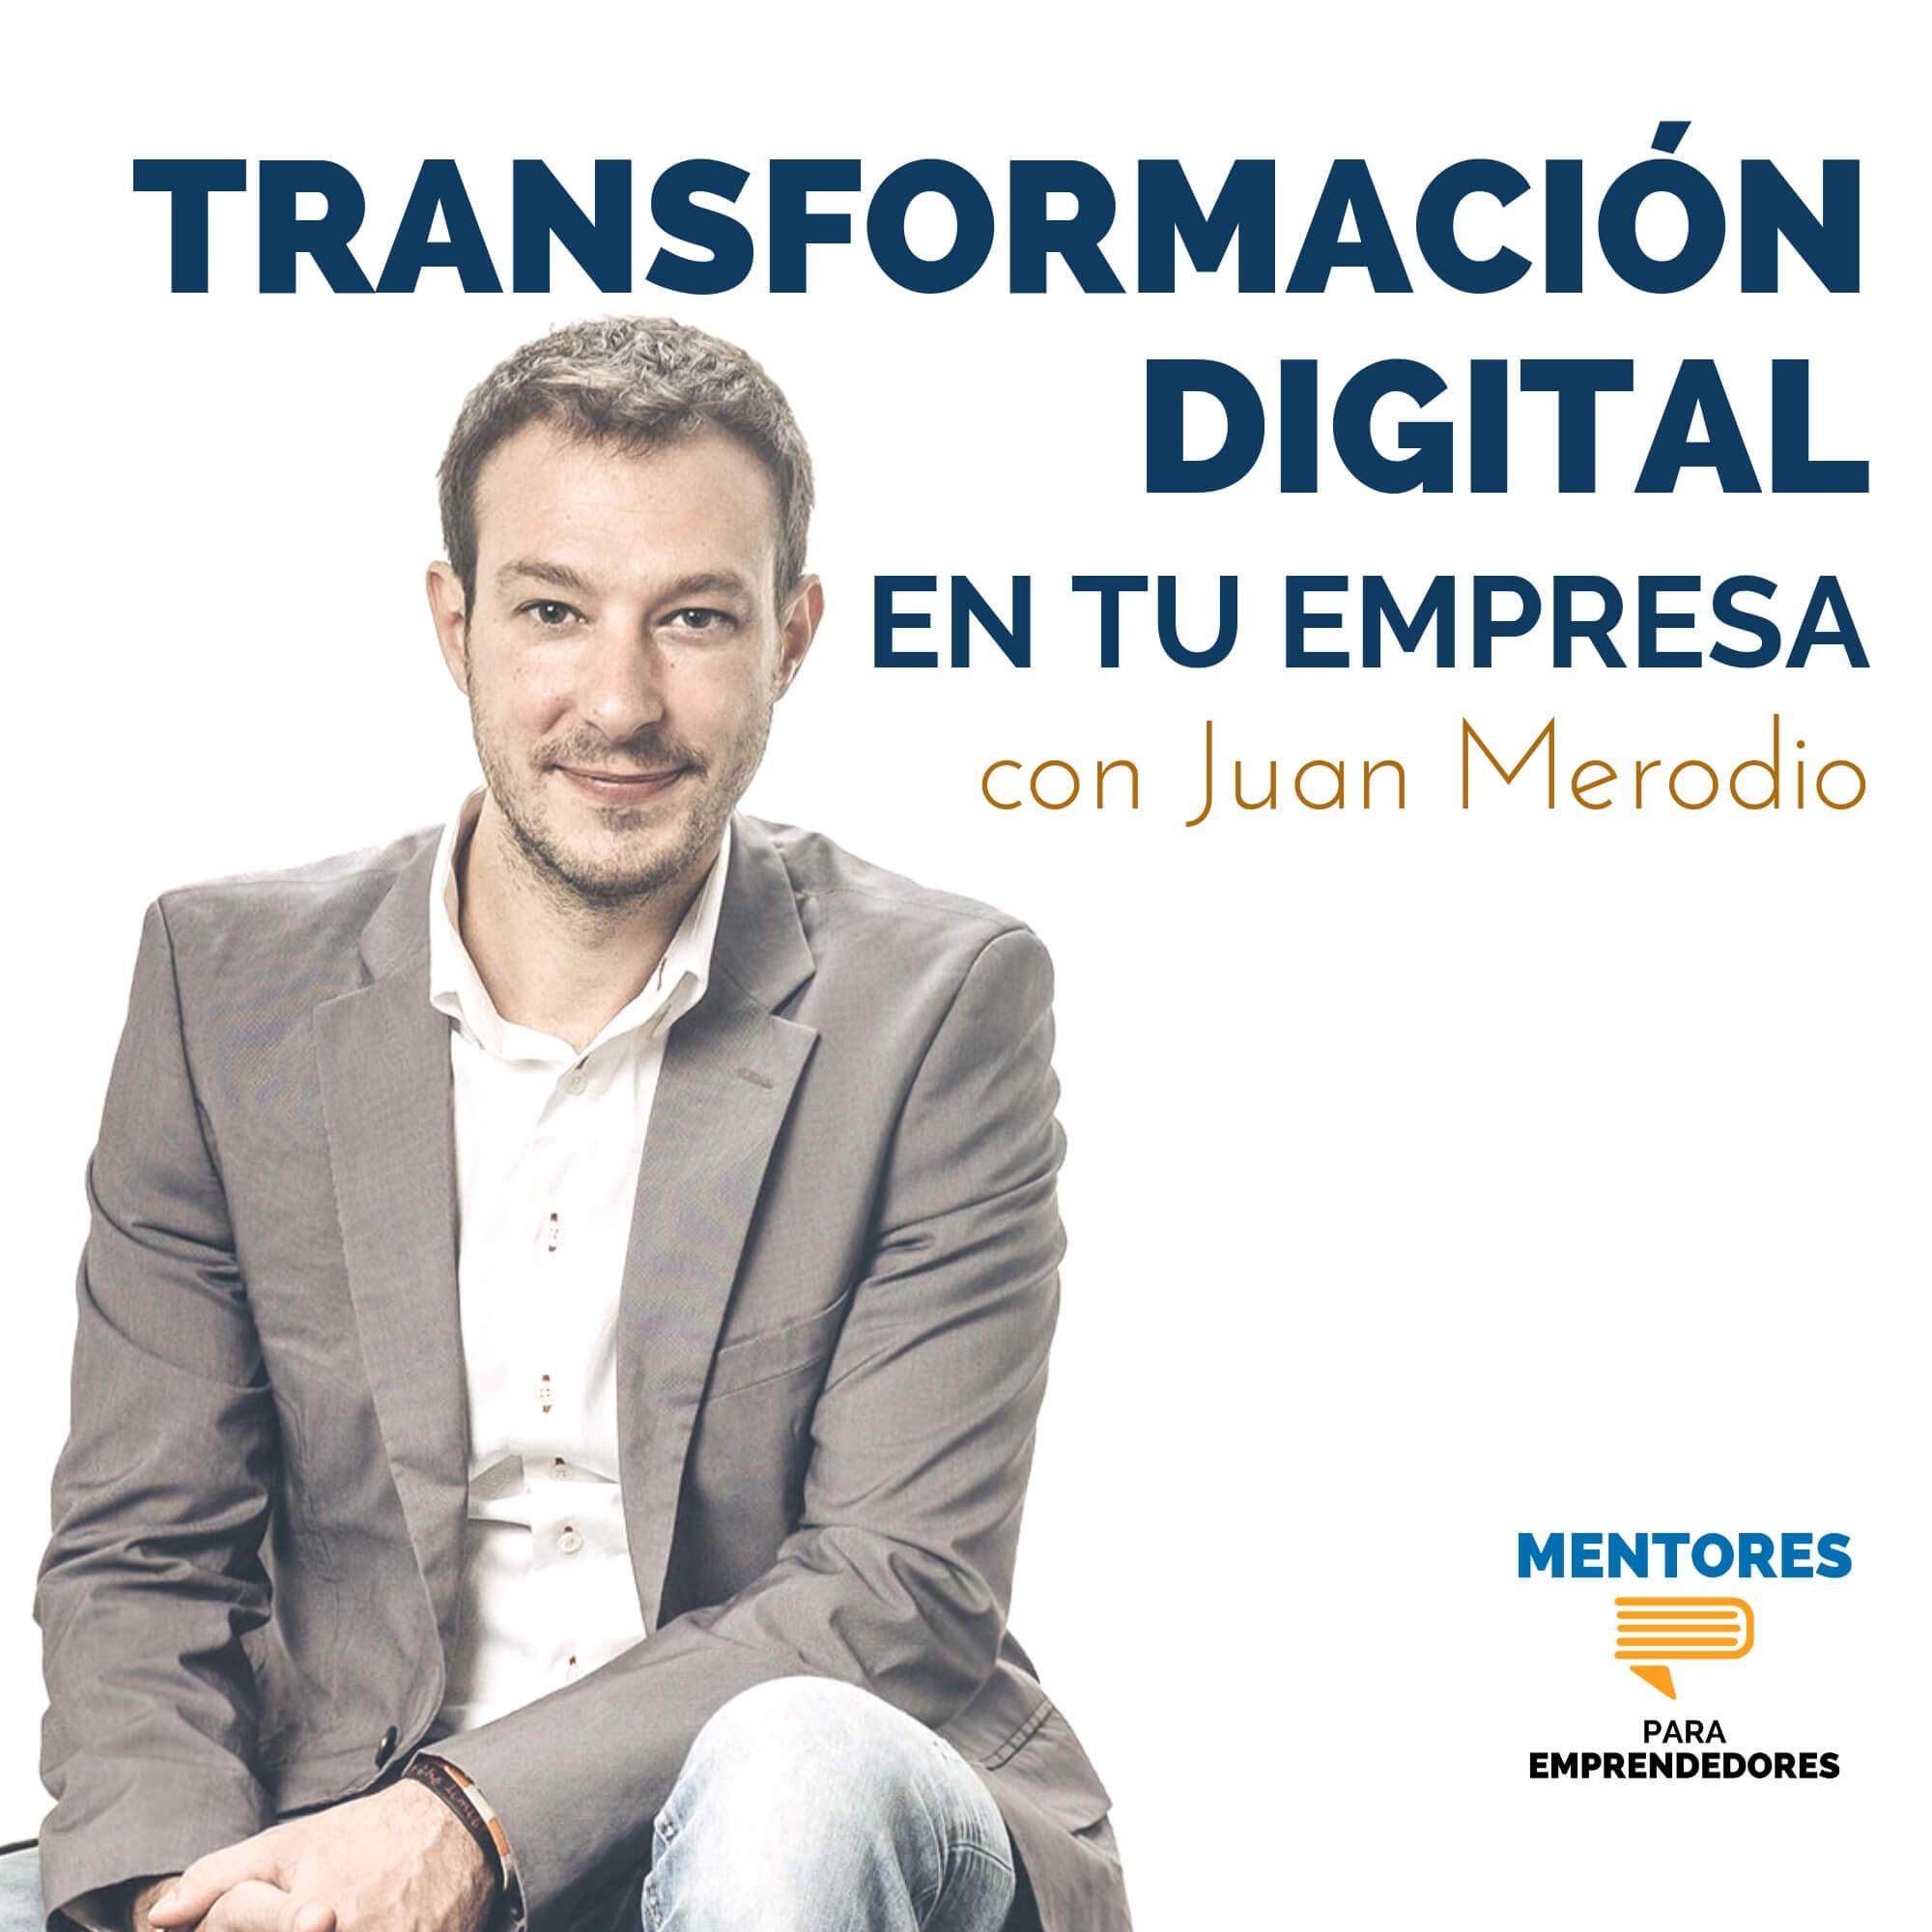 Transformación Digital en tu Empresa, con Juan Merodio - Mentores para Emprendedores